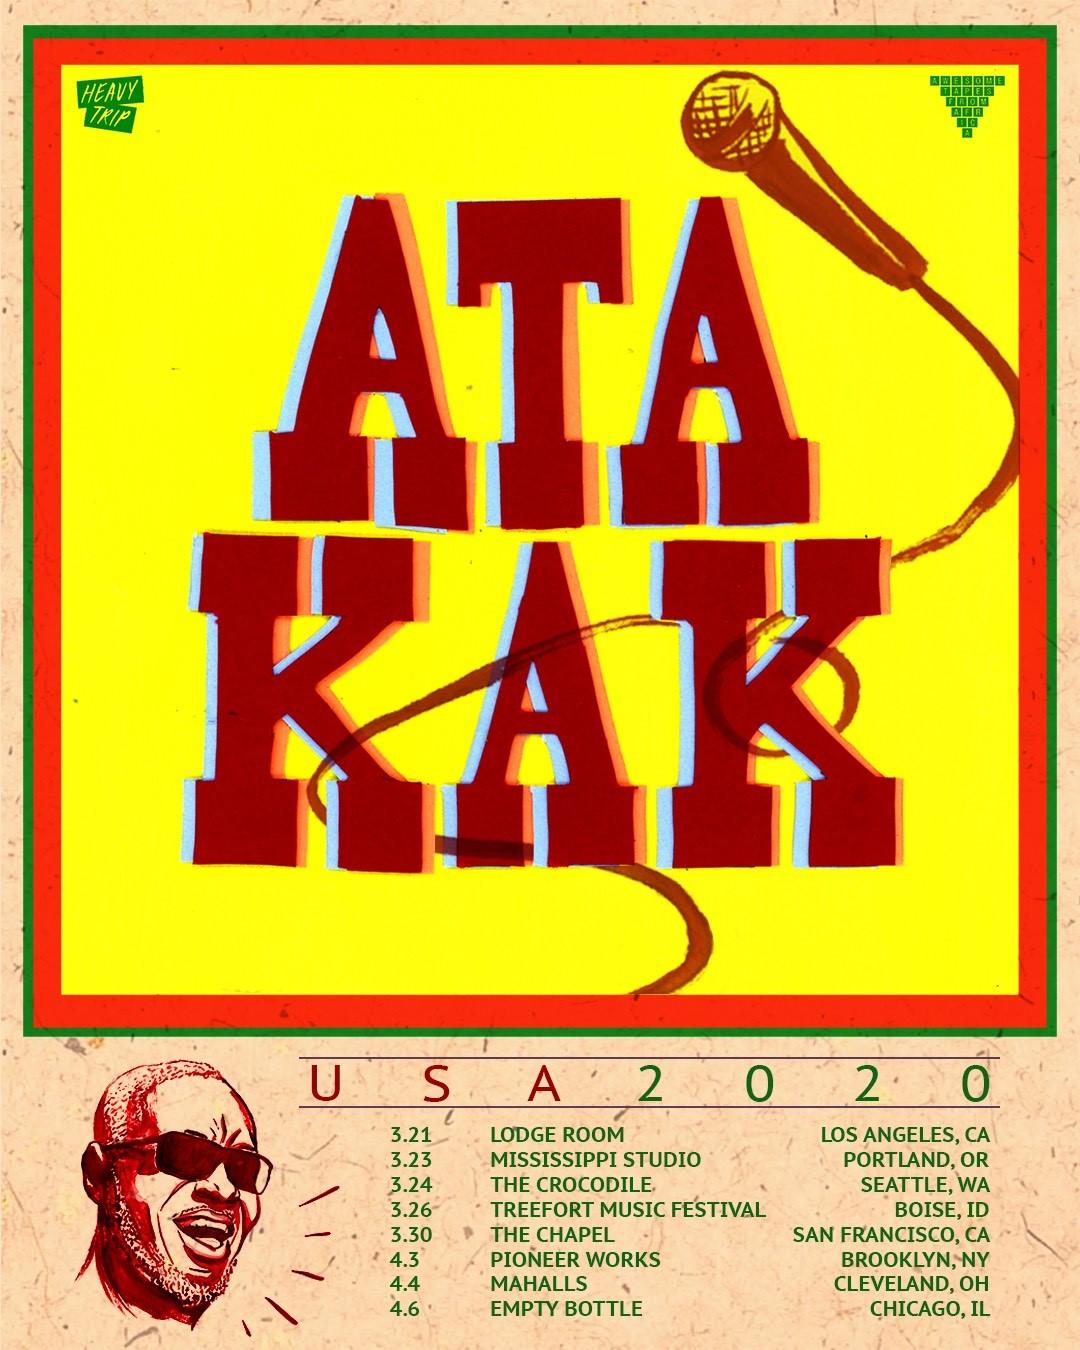 News: Ghanaian Artisit Ata Kak Announces His Very First USTour